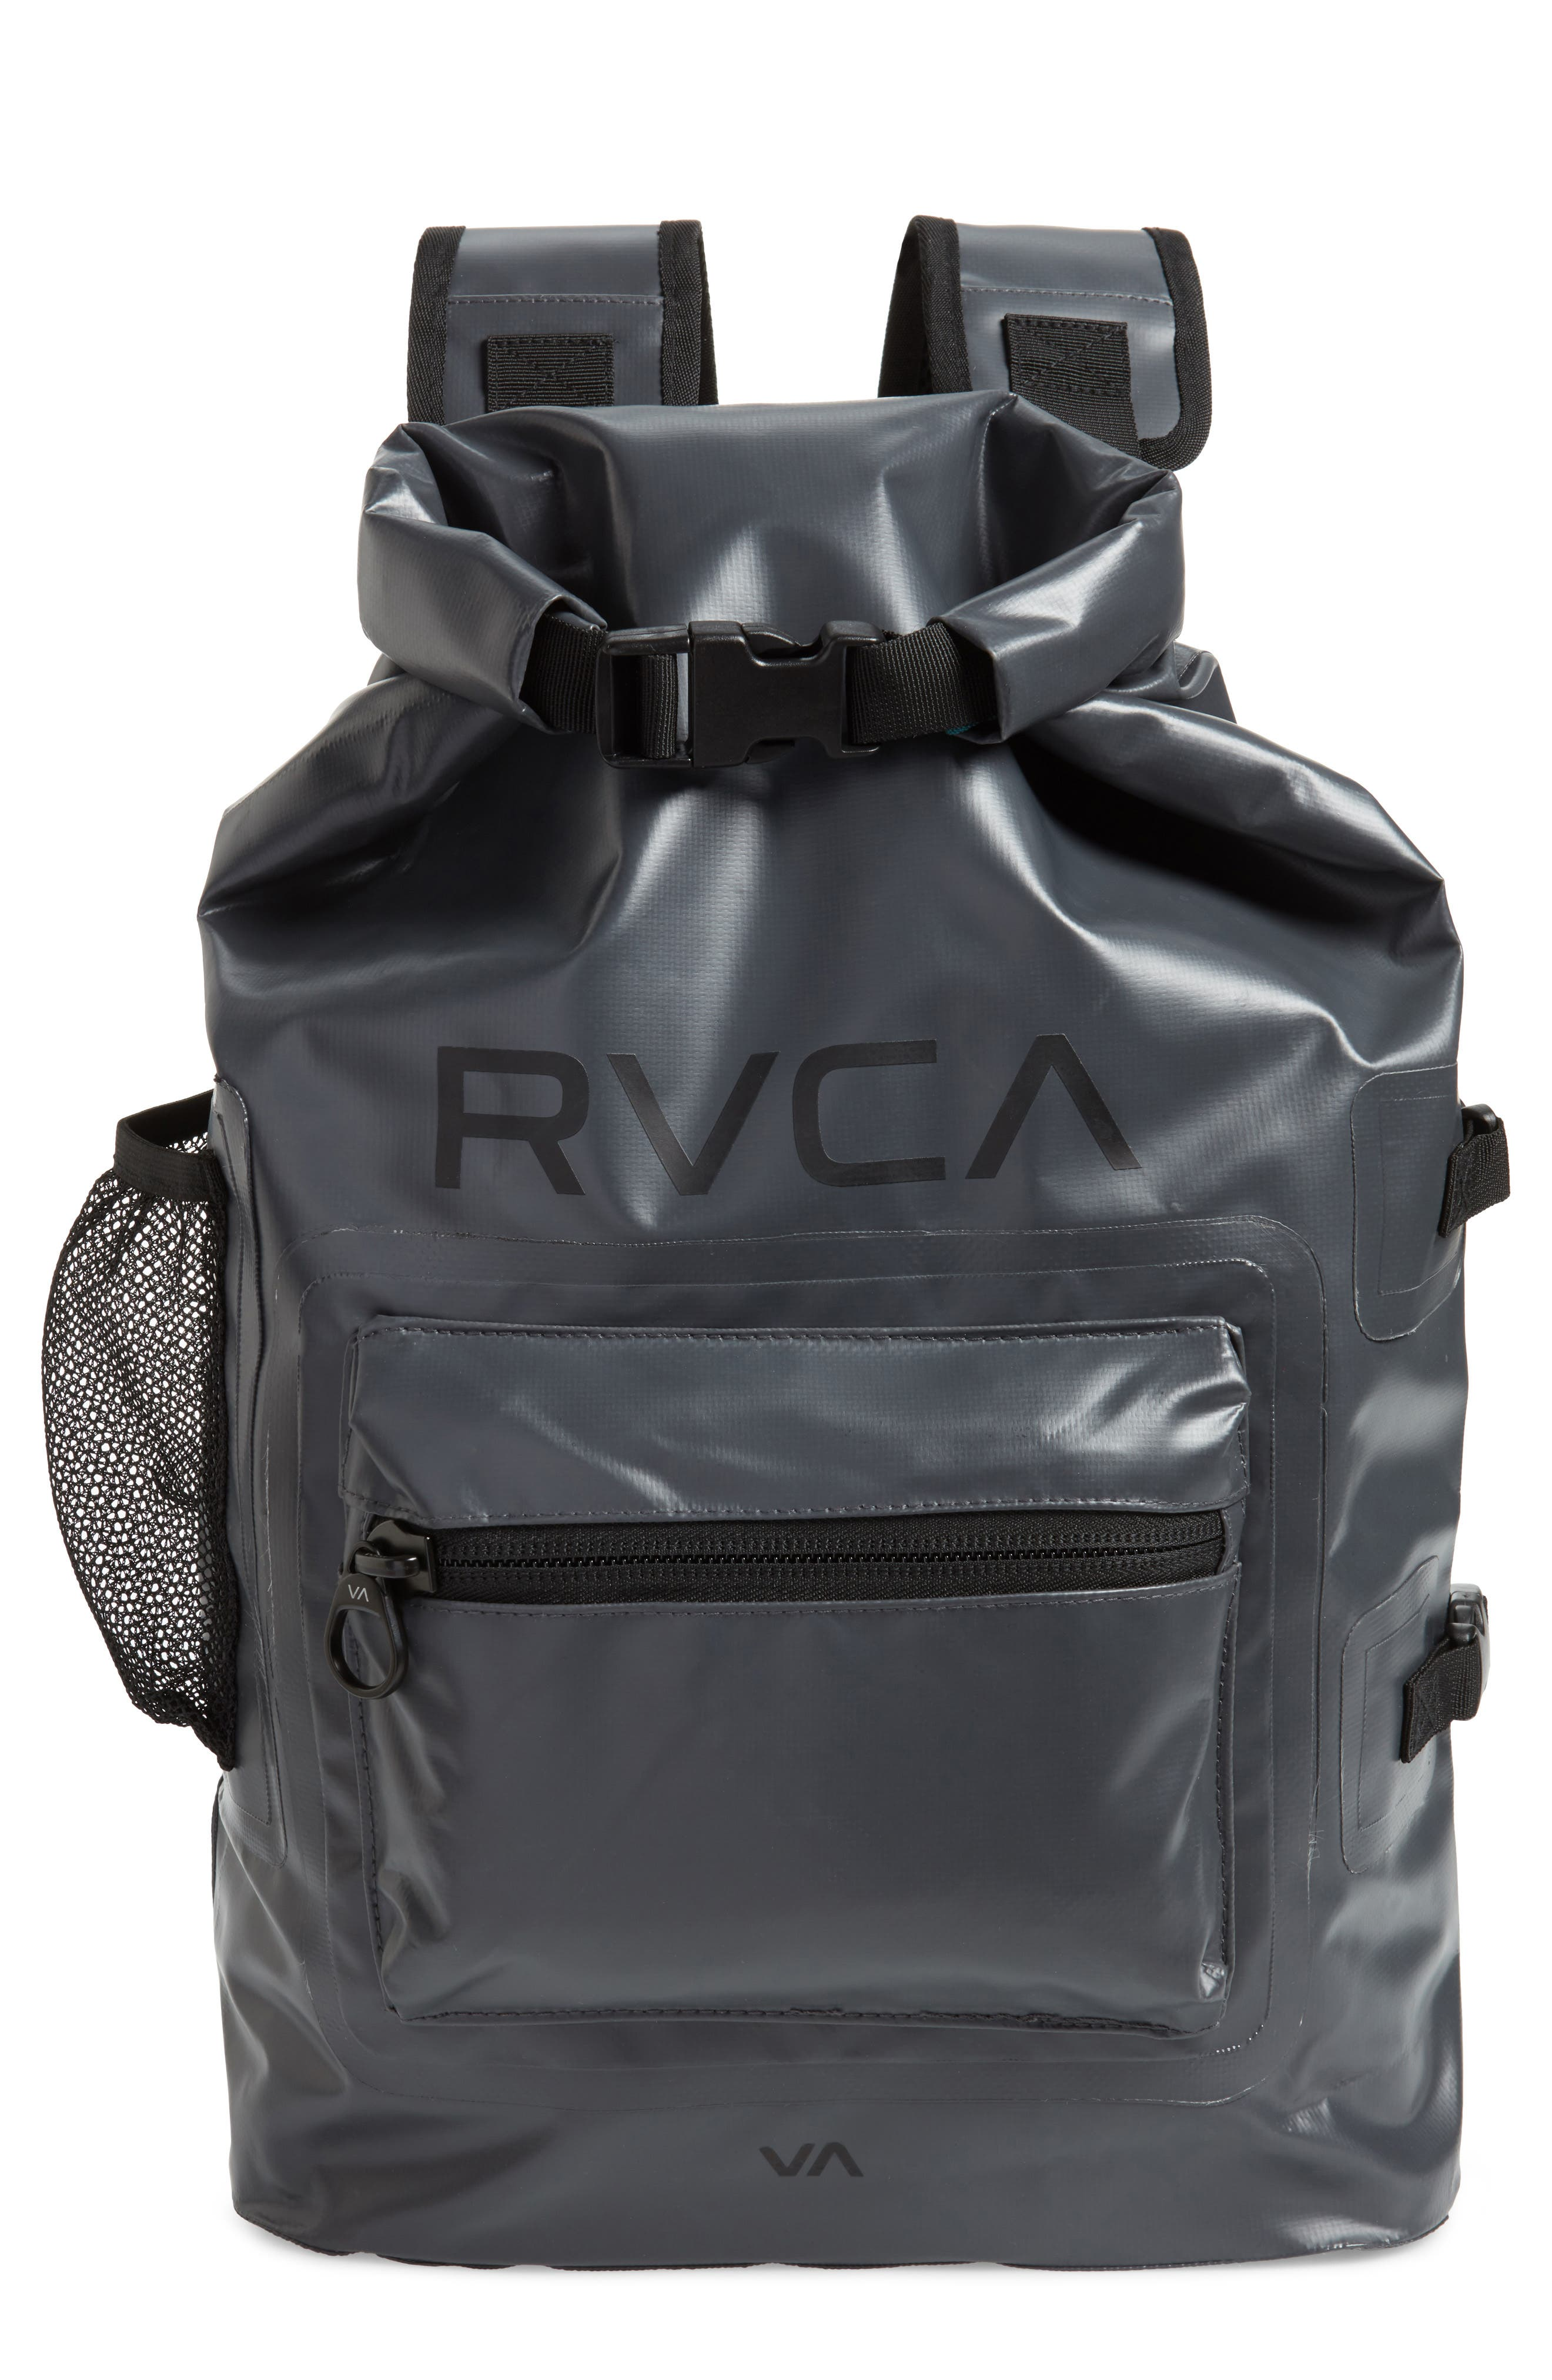 Go Be II Waterproof Backpack,                             Main thumbnail 1, color,                             020